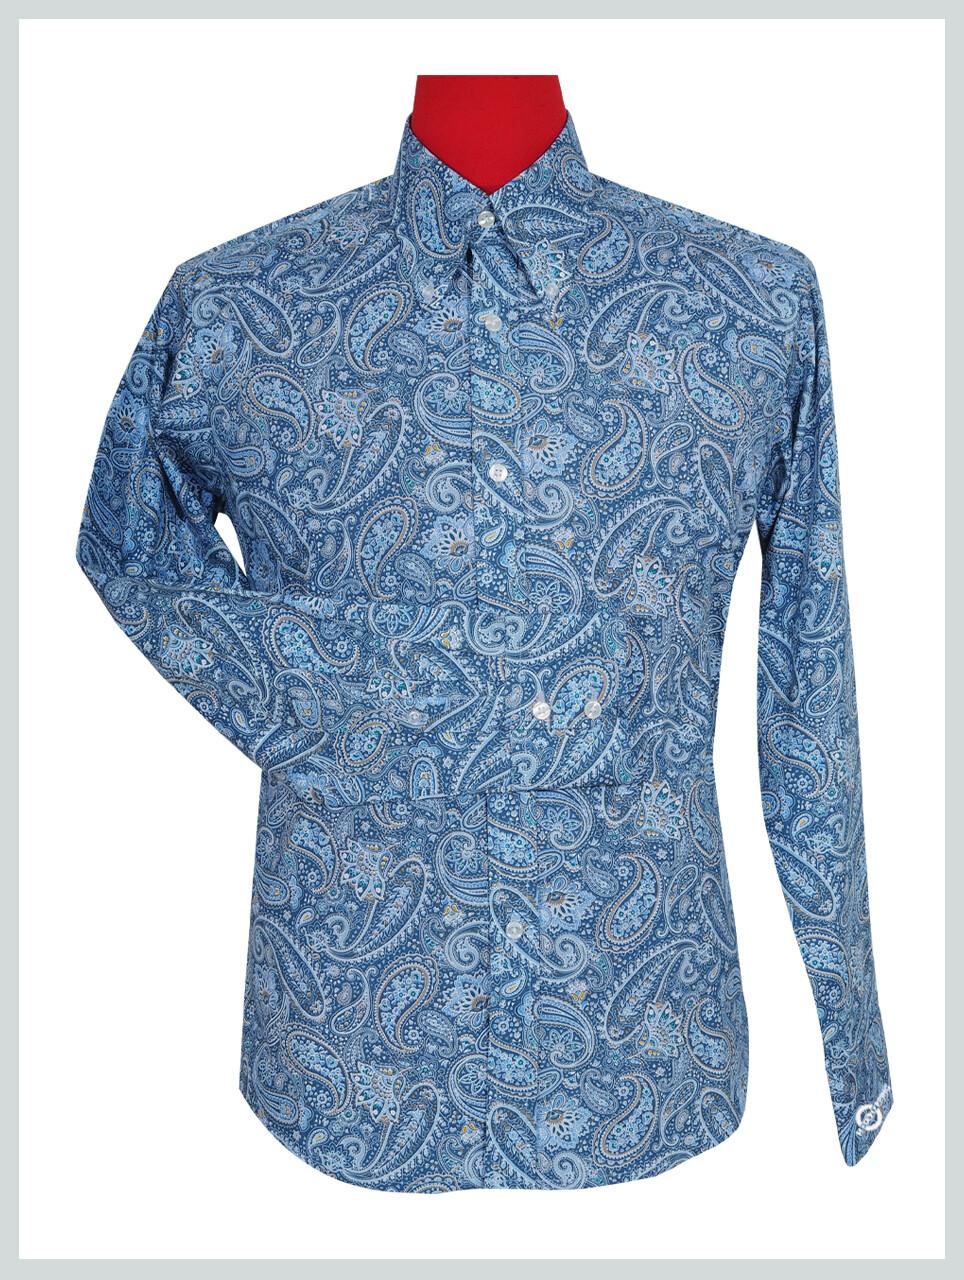 Paisley Shirt | Blue Multi Color Mens Paisley Pattern Shirt